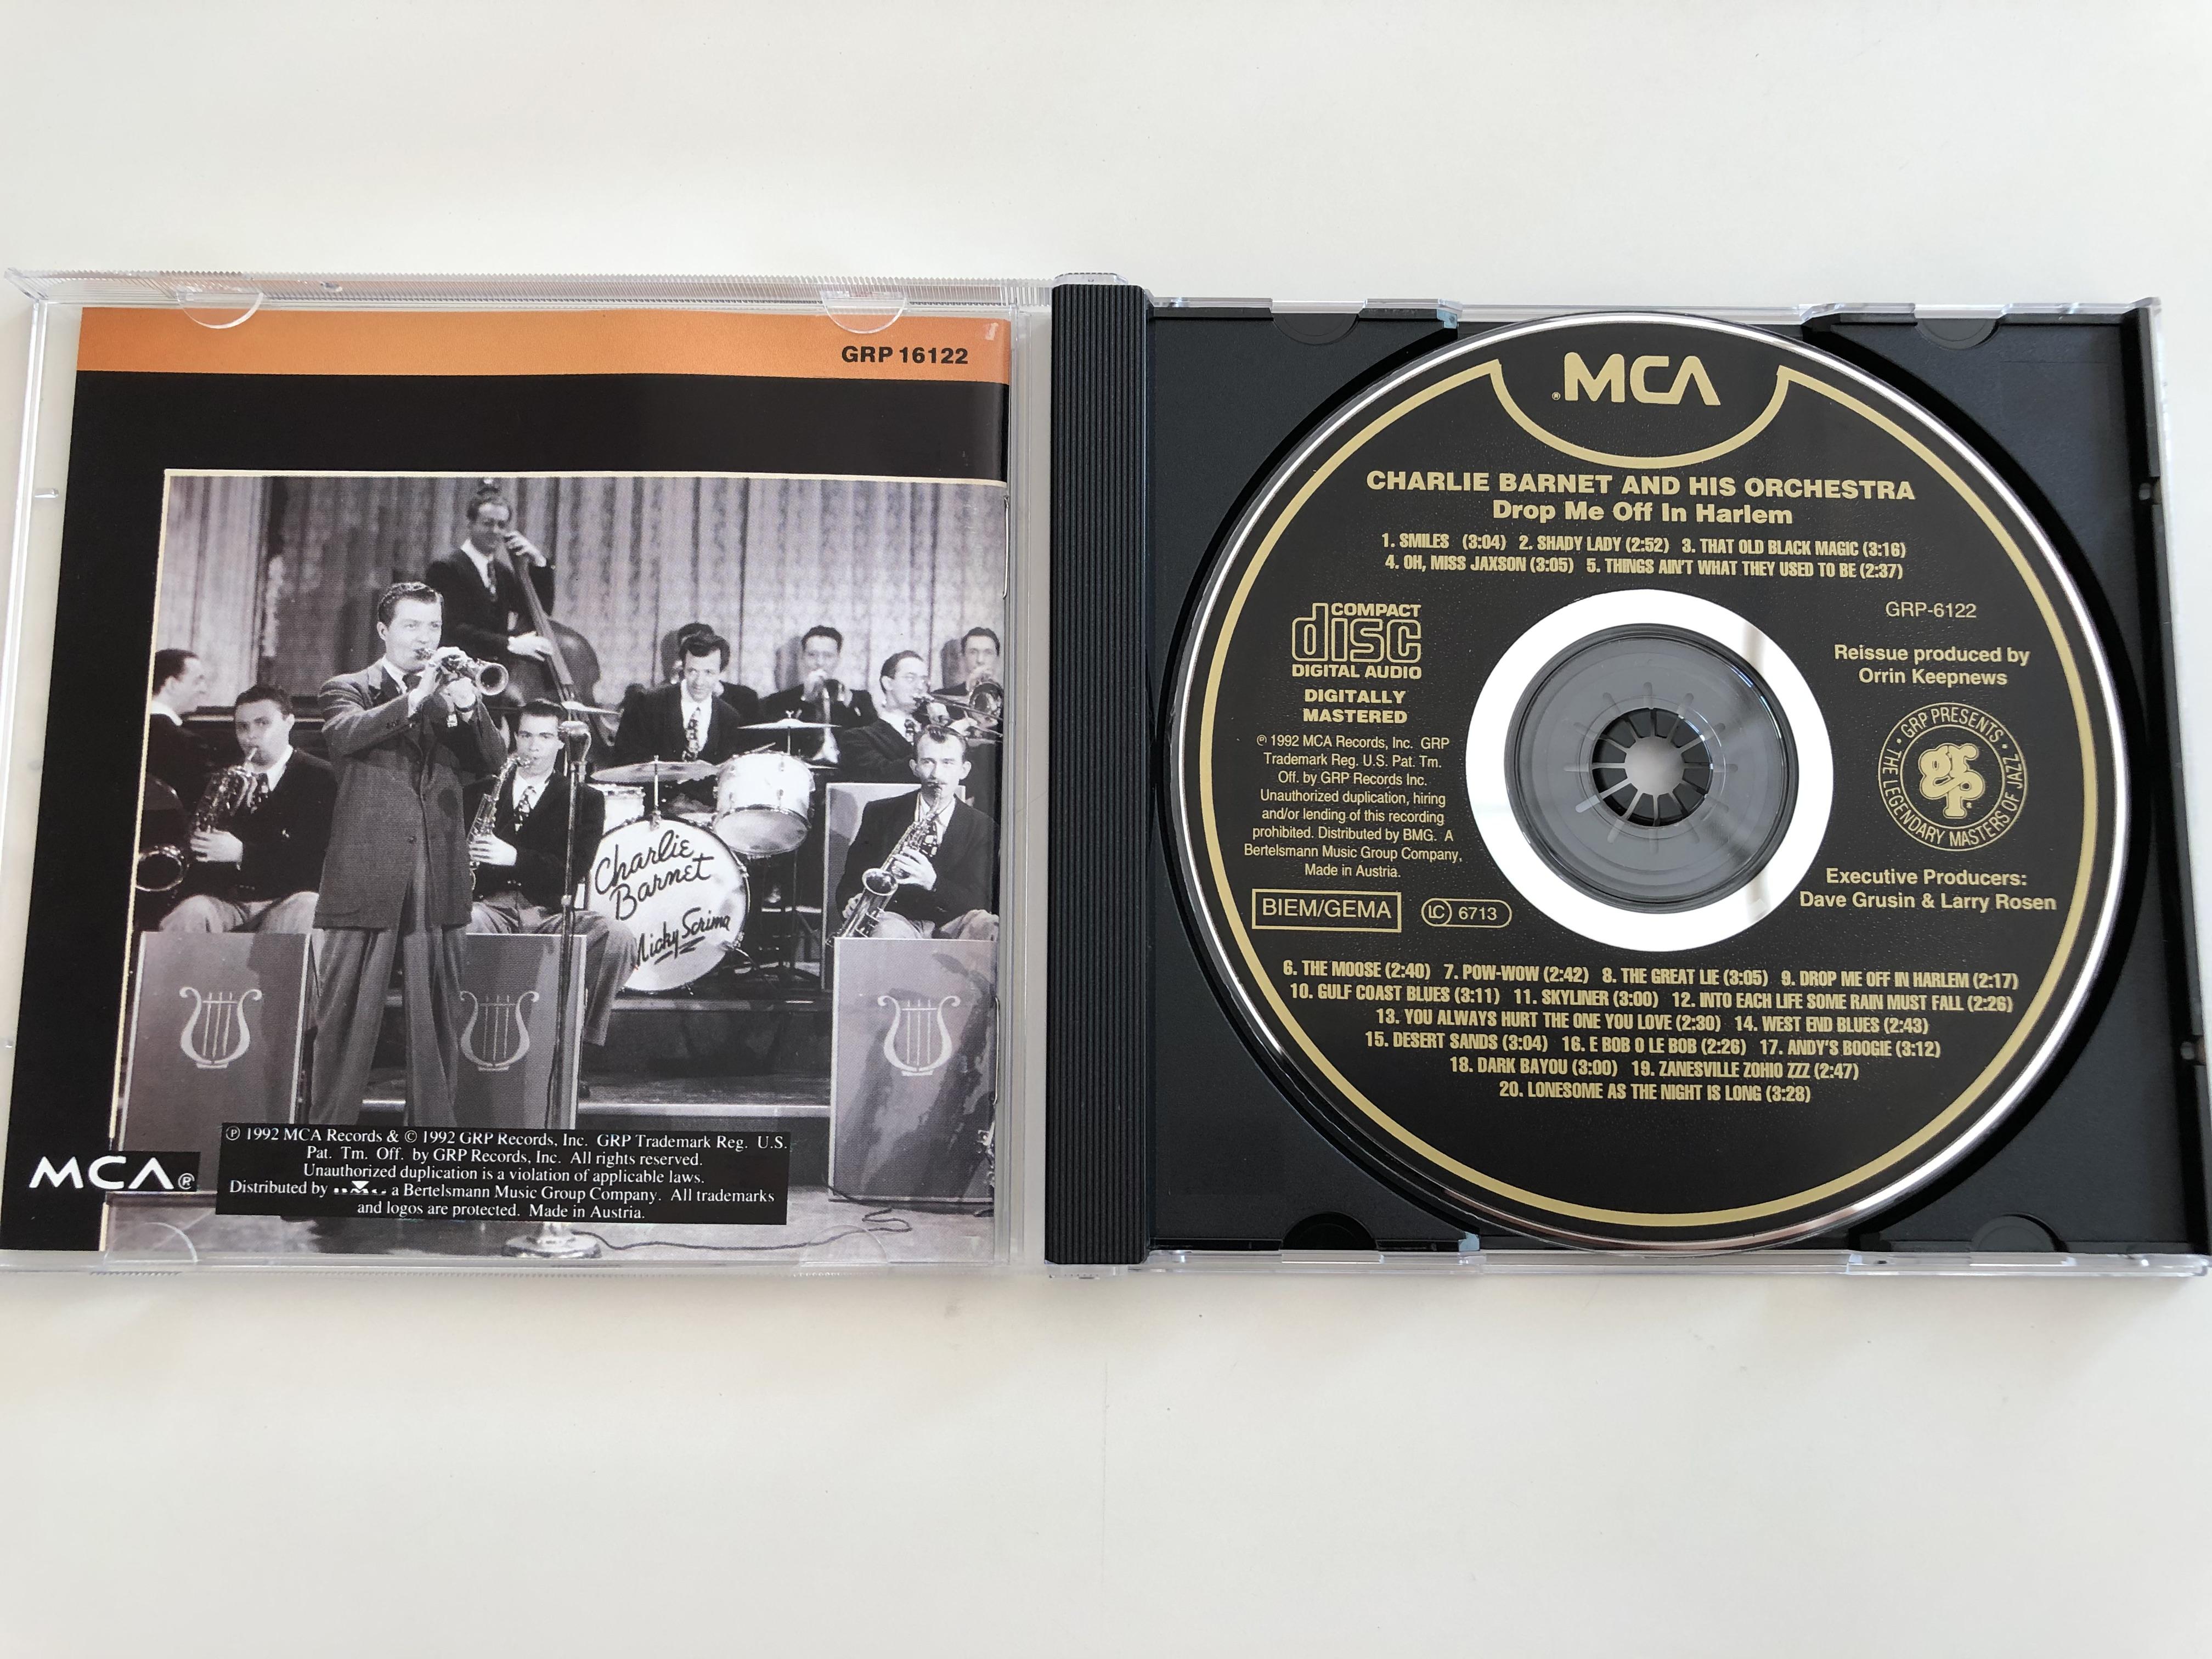 -charlie-barnet-his-orchestra-drop-me-off-in-harlem-the-original-american-decca-recordings-audio-cd-1992-grp-6122-9-.jpg